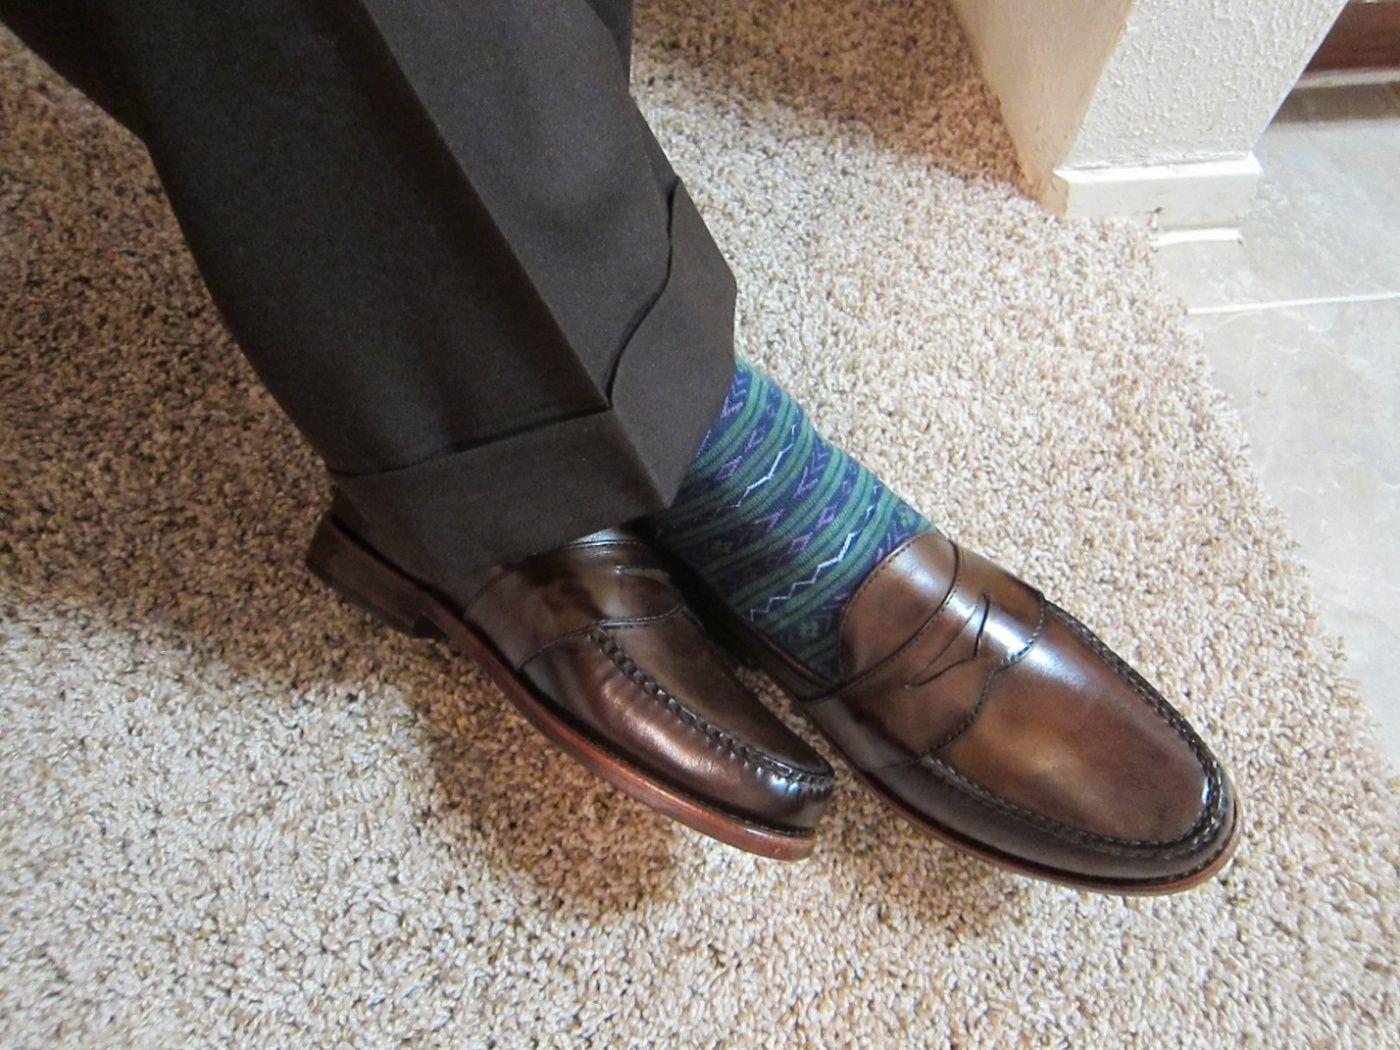 Ботинки под костюм мужской